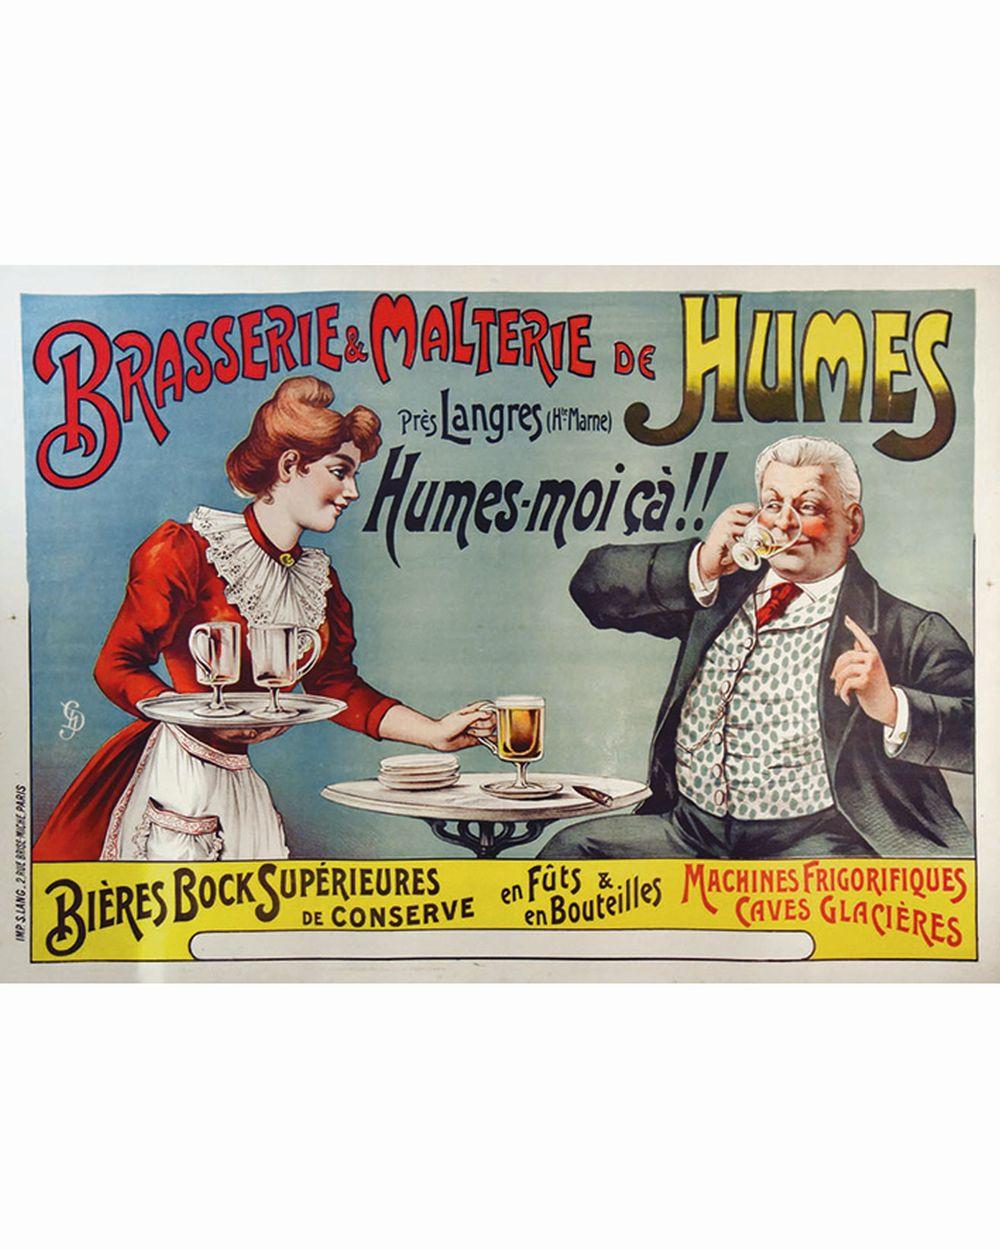 G. D. - Brasserie & Malterie de Humes - Bières Bock     vers 1900  Langres (Haute-Marne)